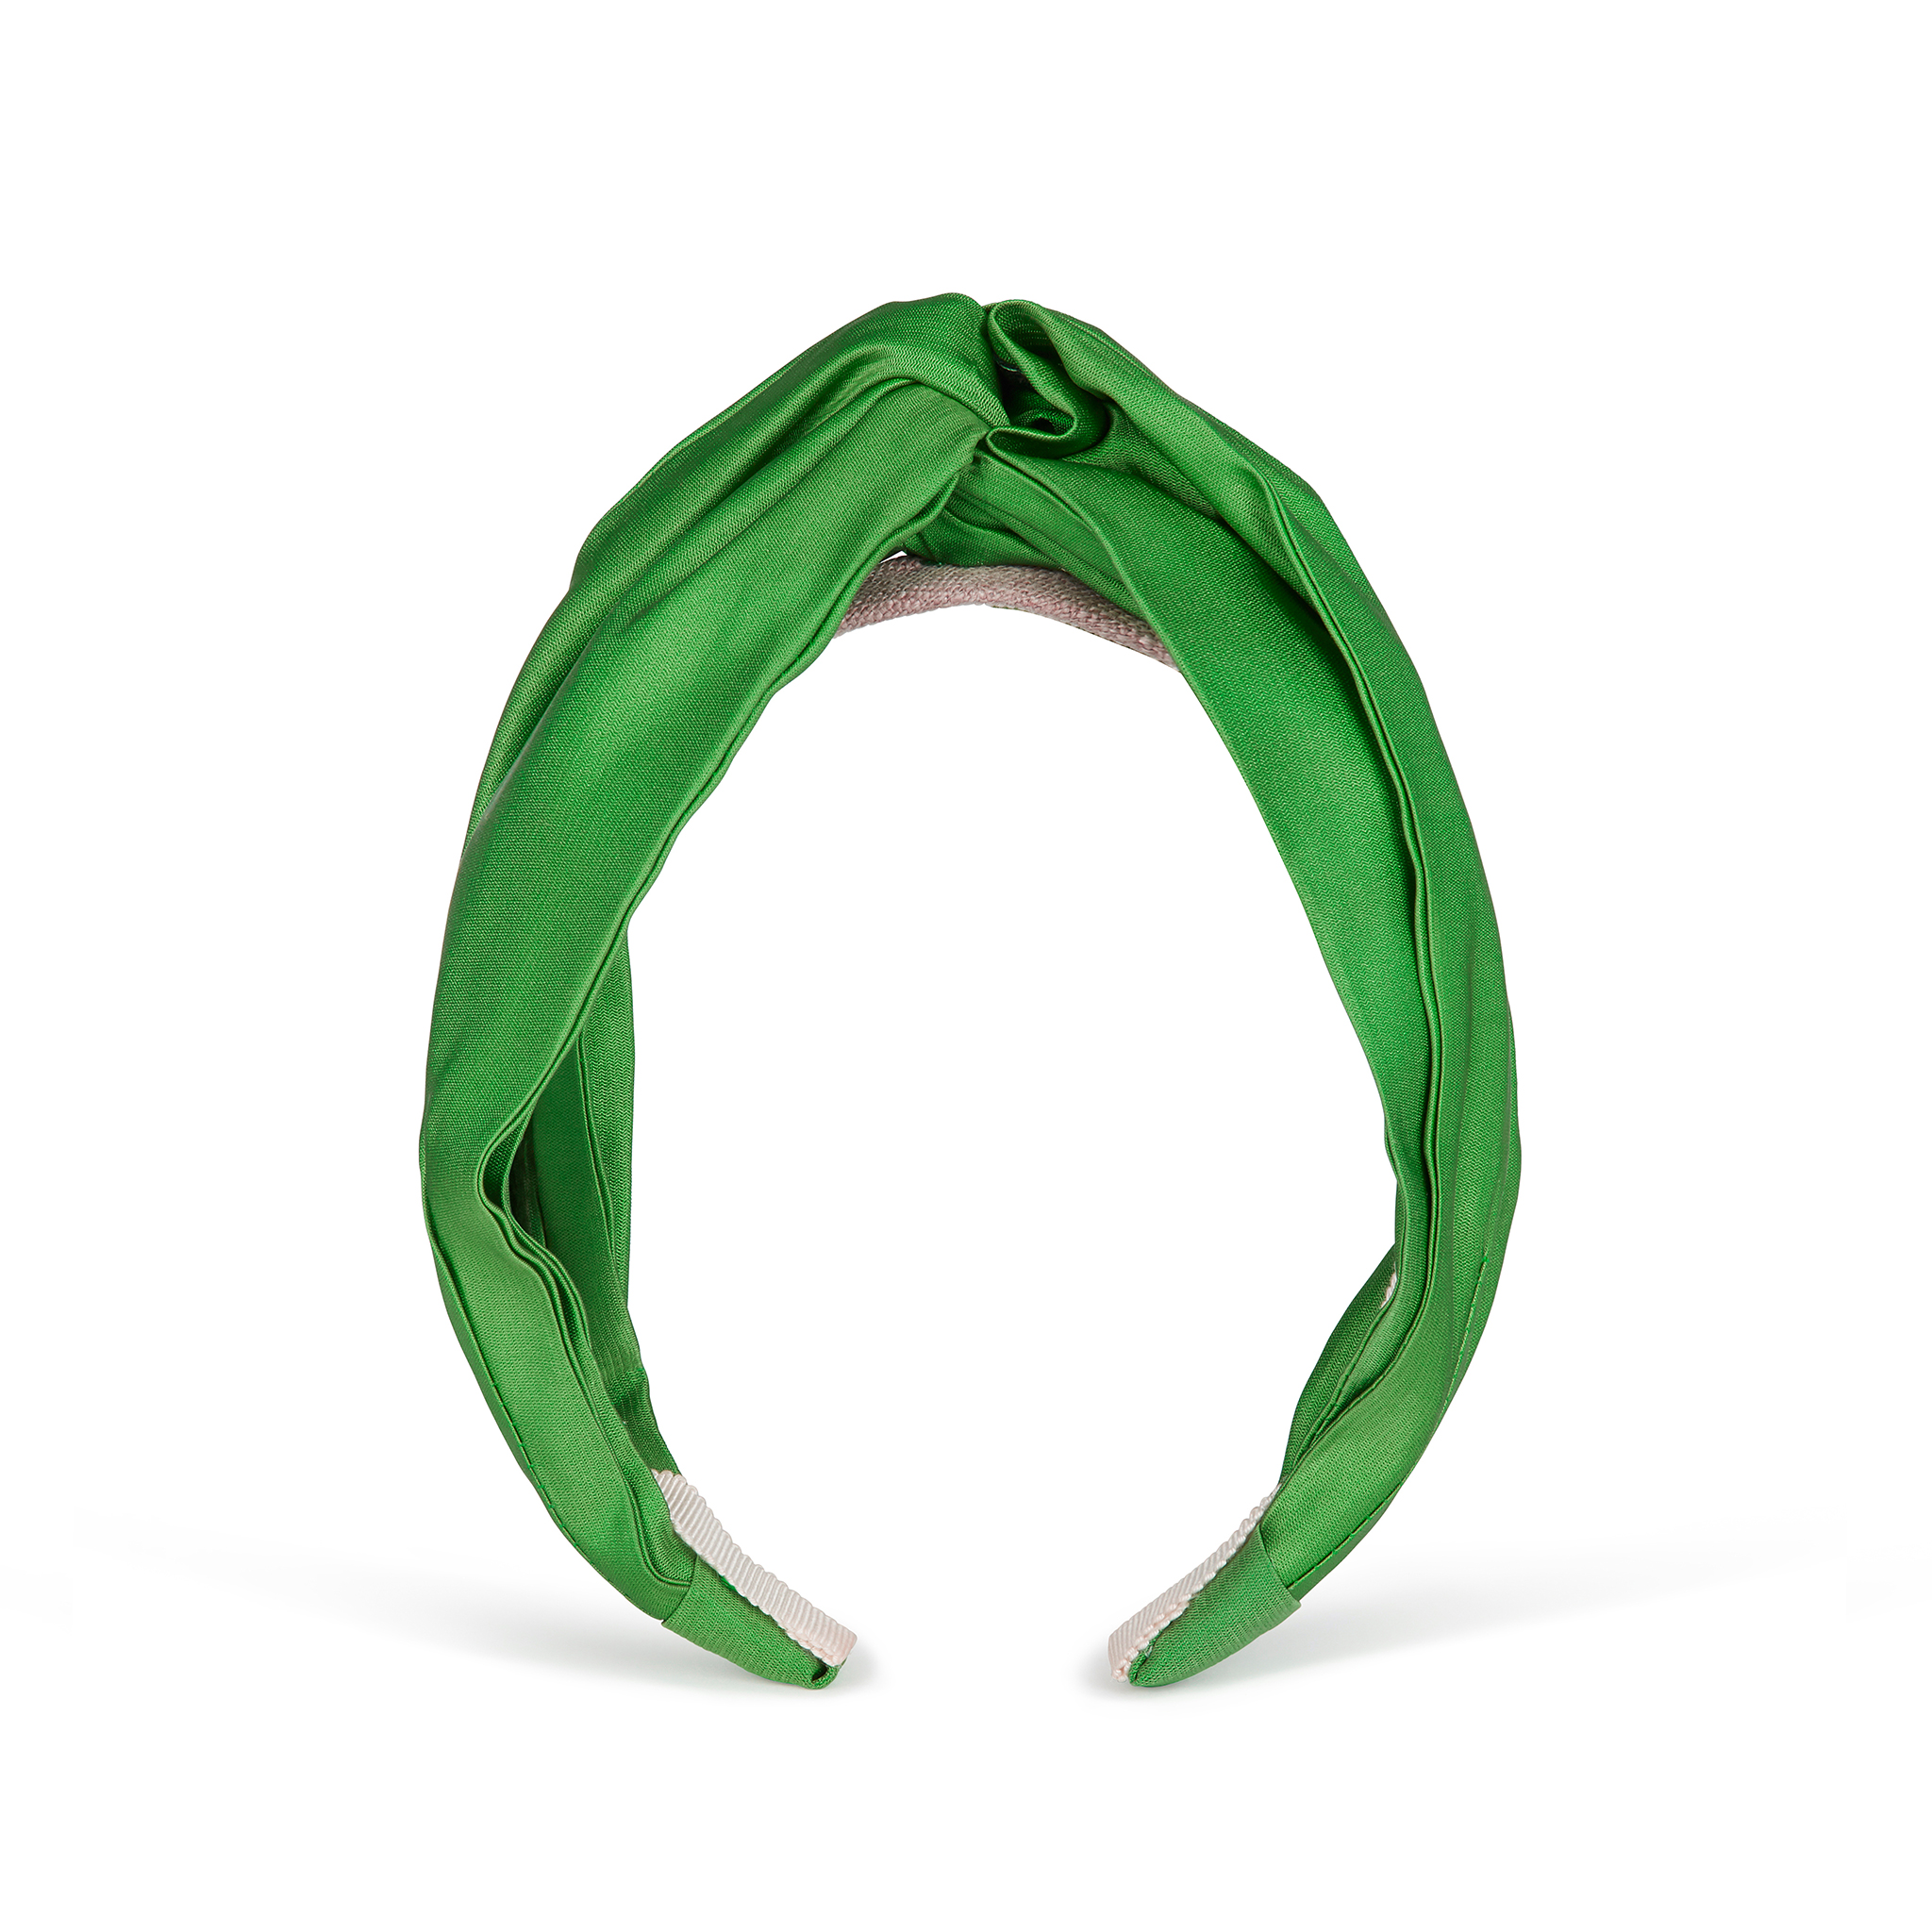 Benoit-headbands-_02.jpg